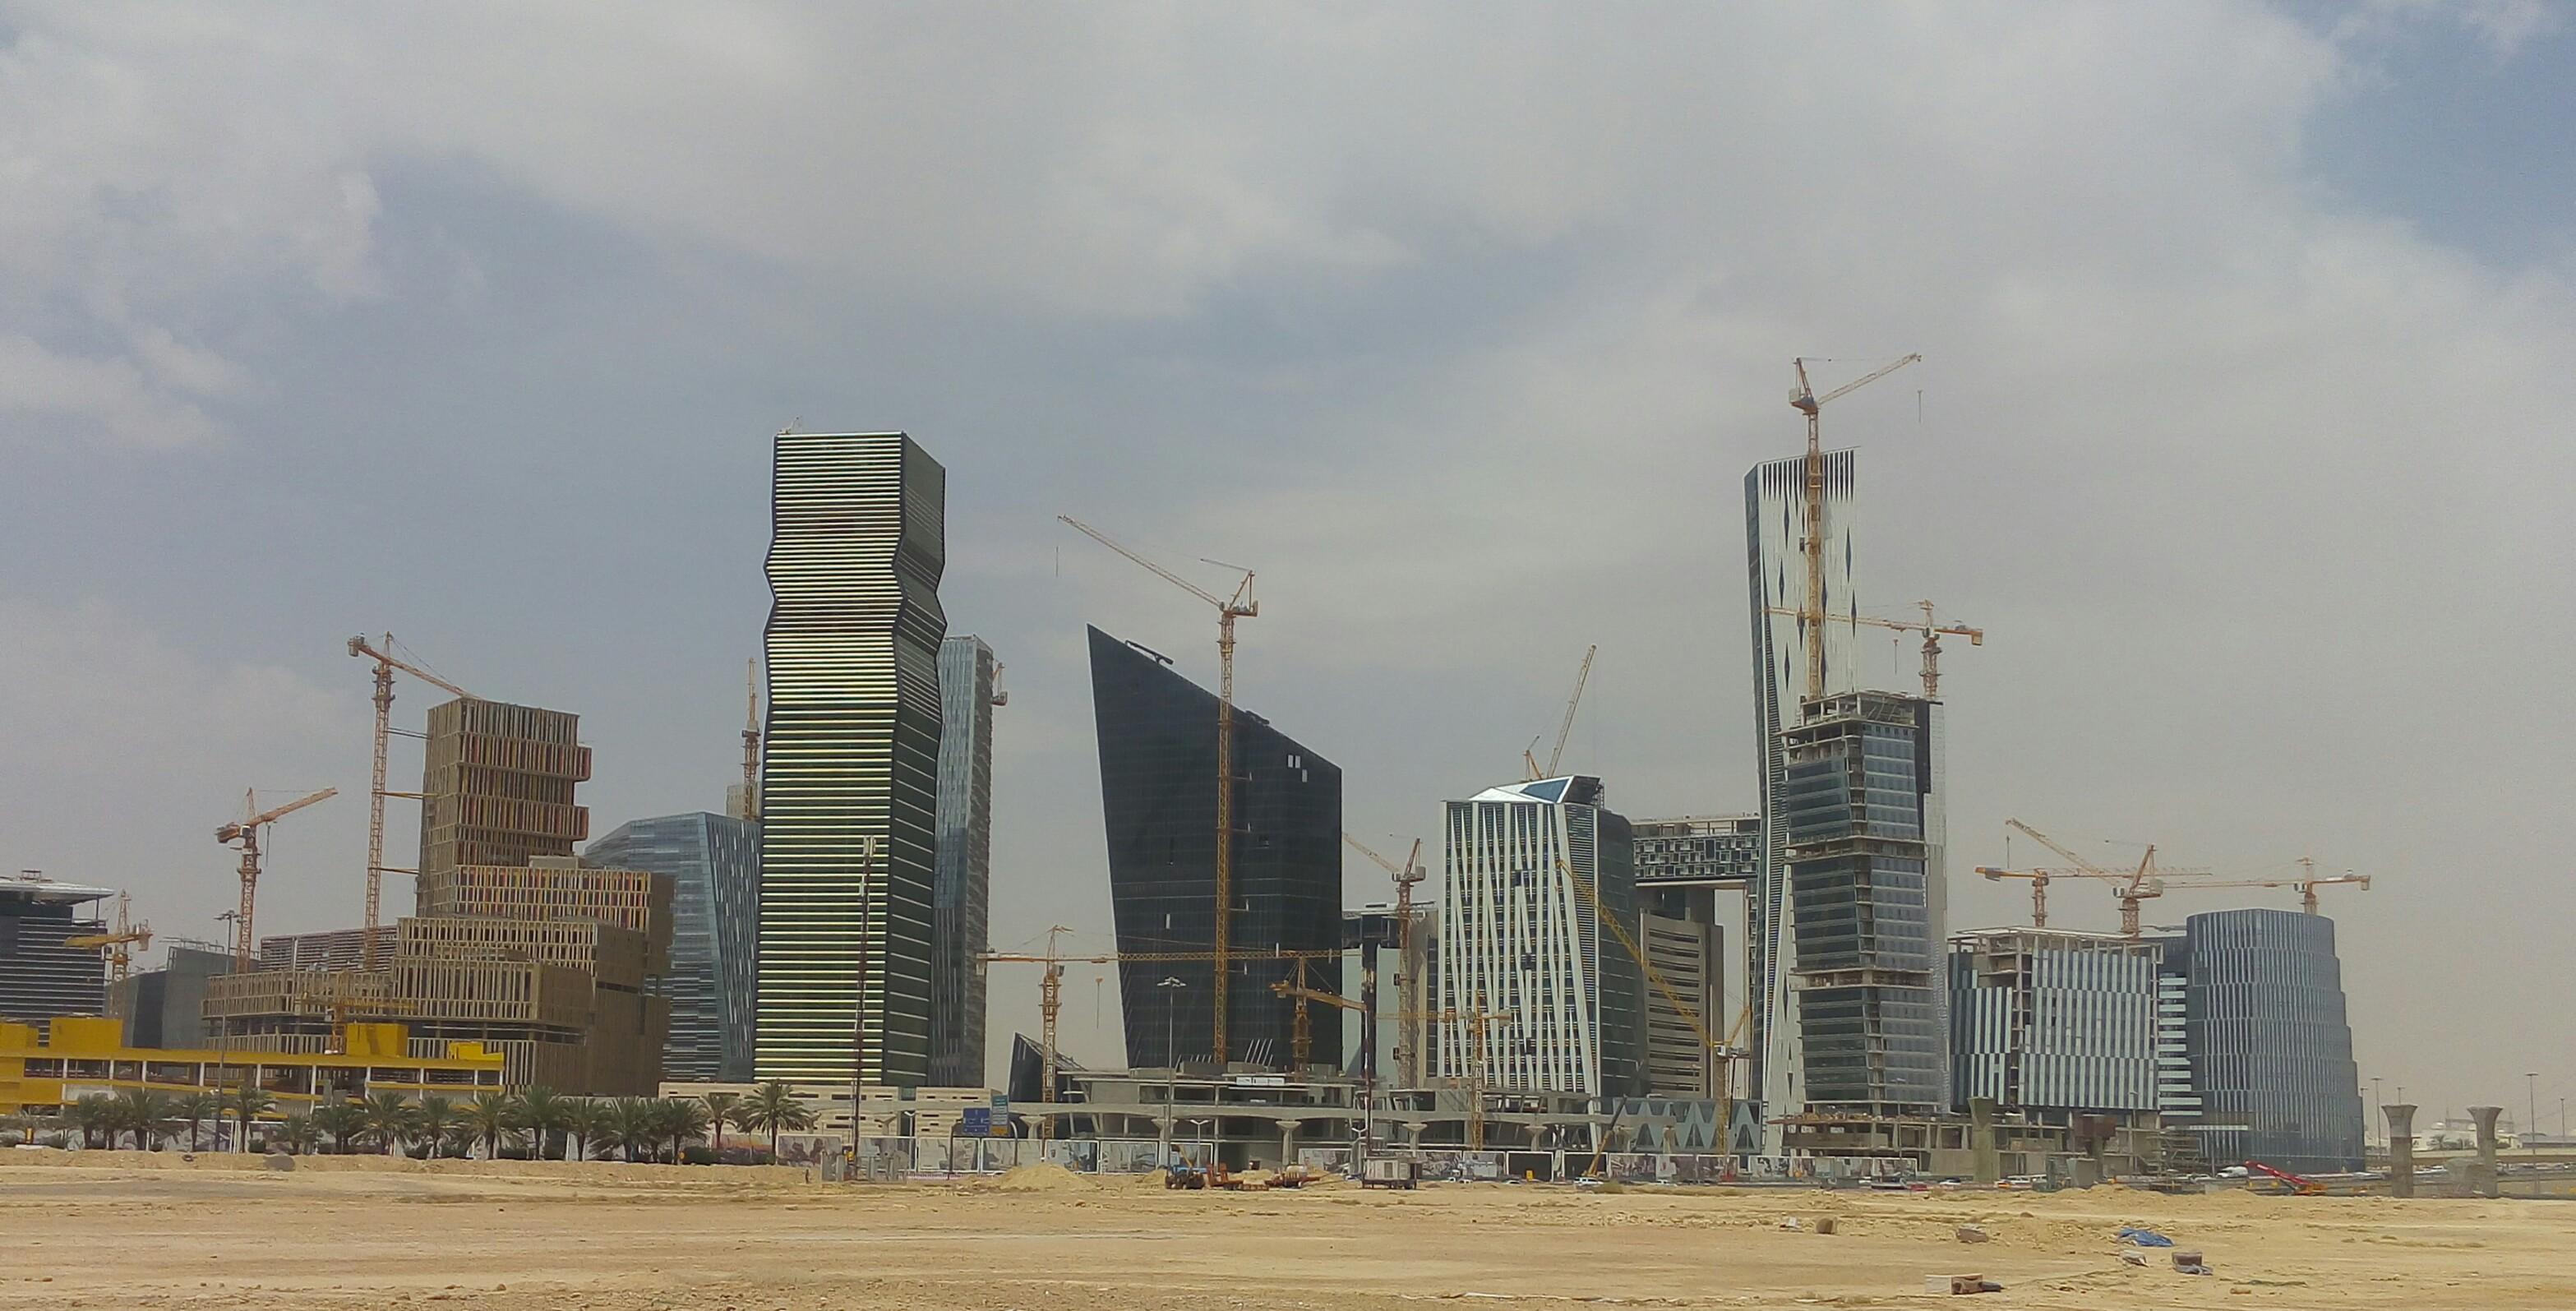 Riyadh City view, Architecture, Building, City, Construction, HQ Photo